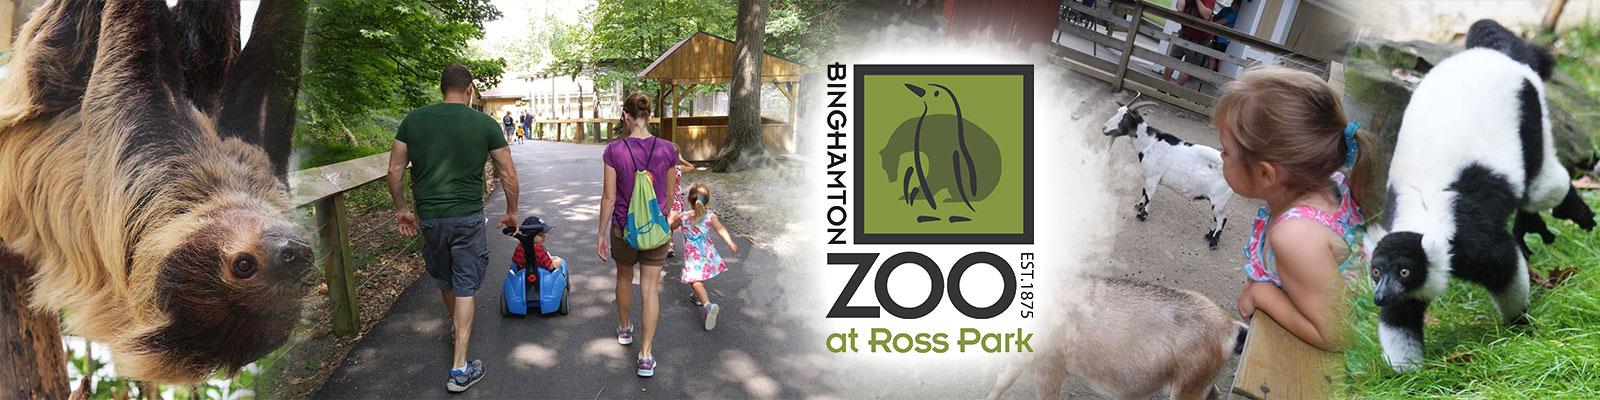 Binghamton Zoo Ross Park BiziFit